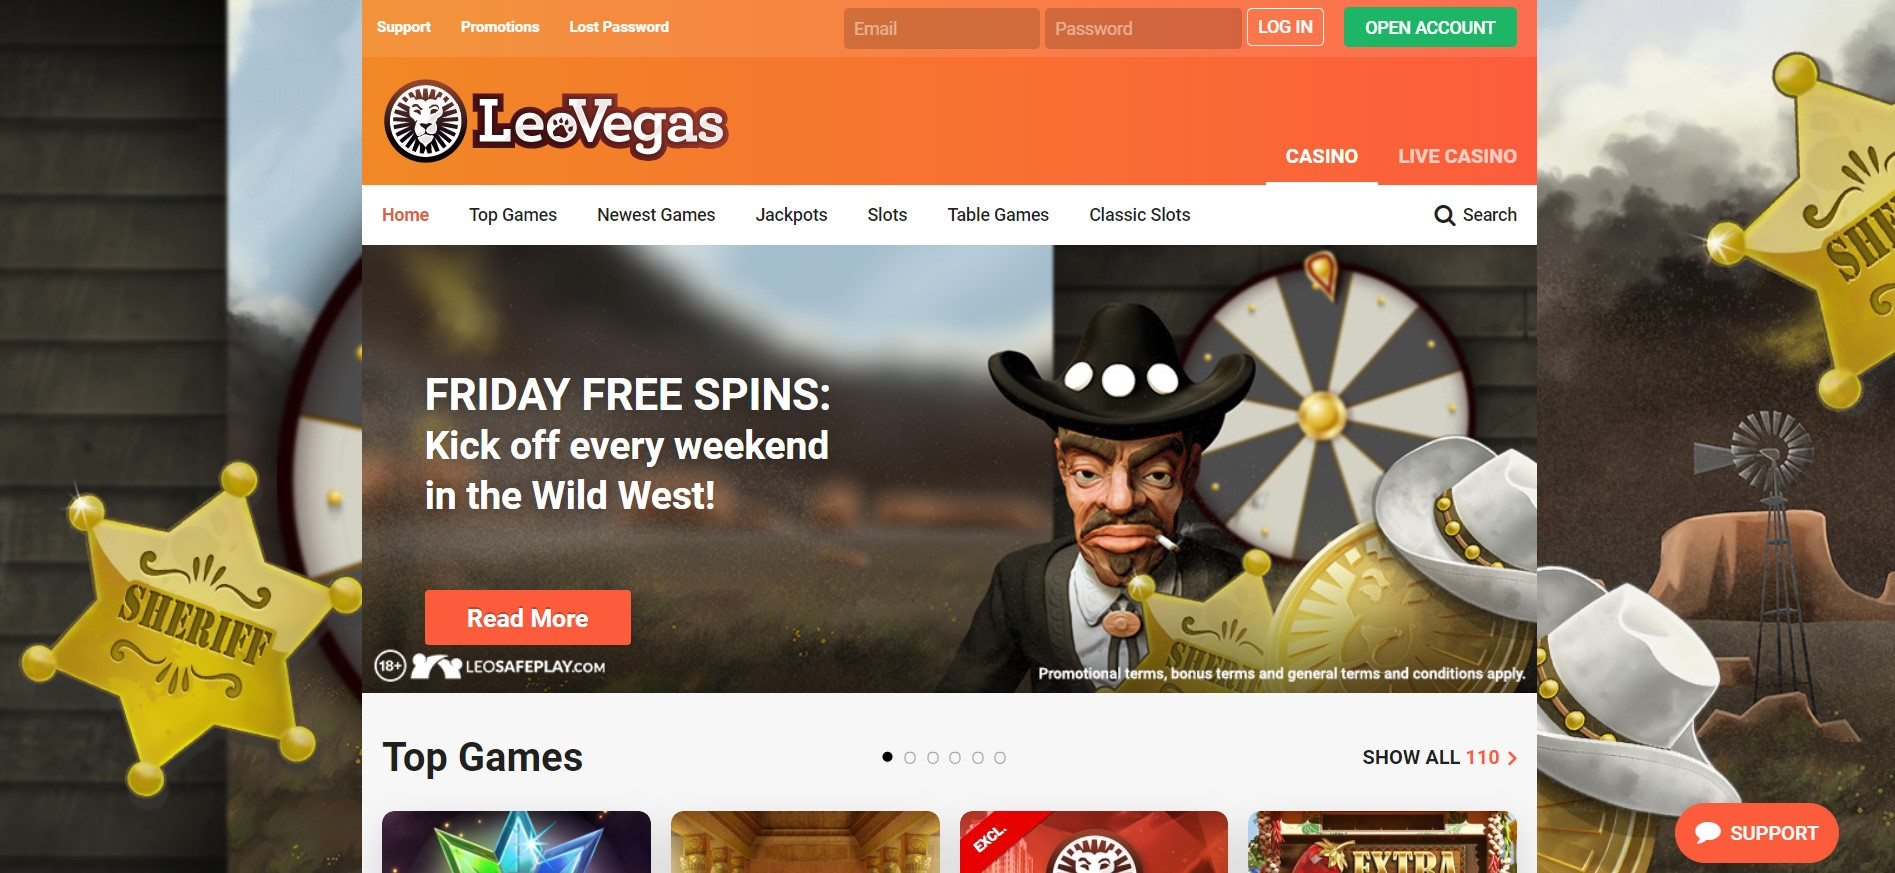 LeoVegas Casino welcome